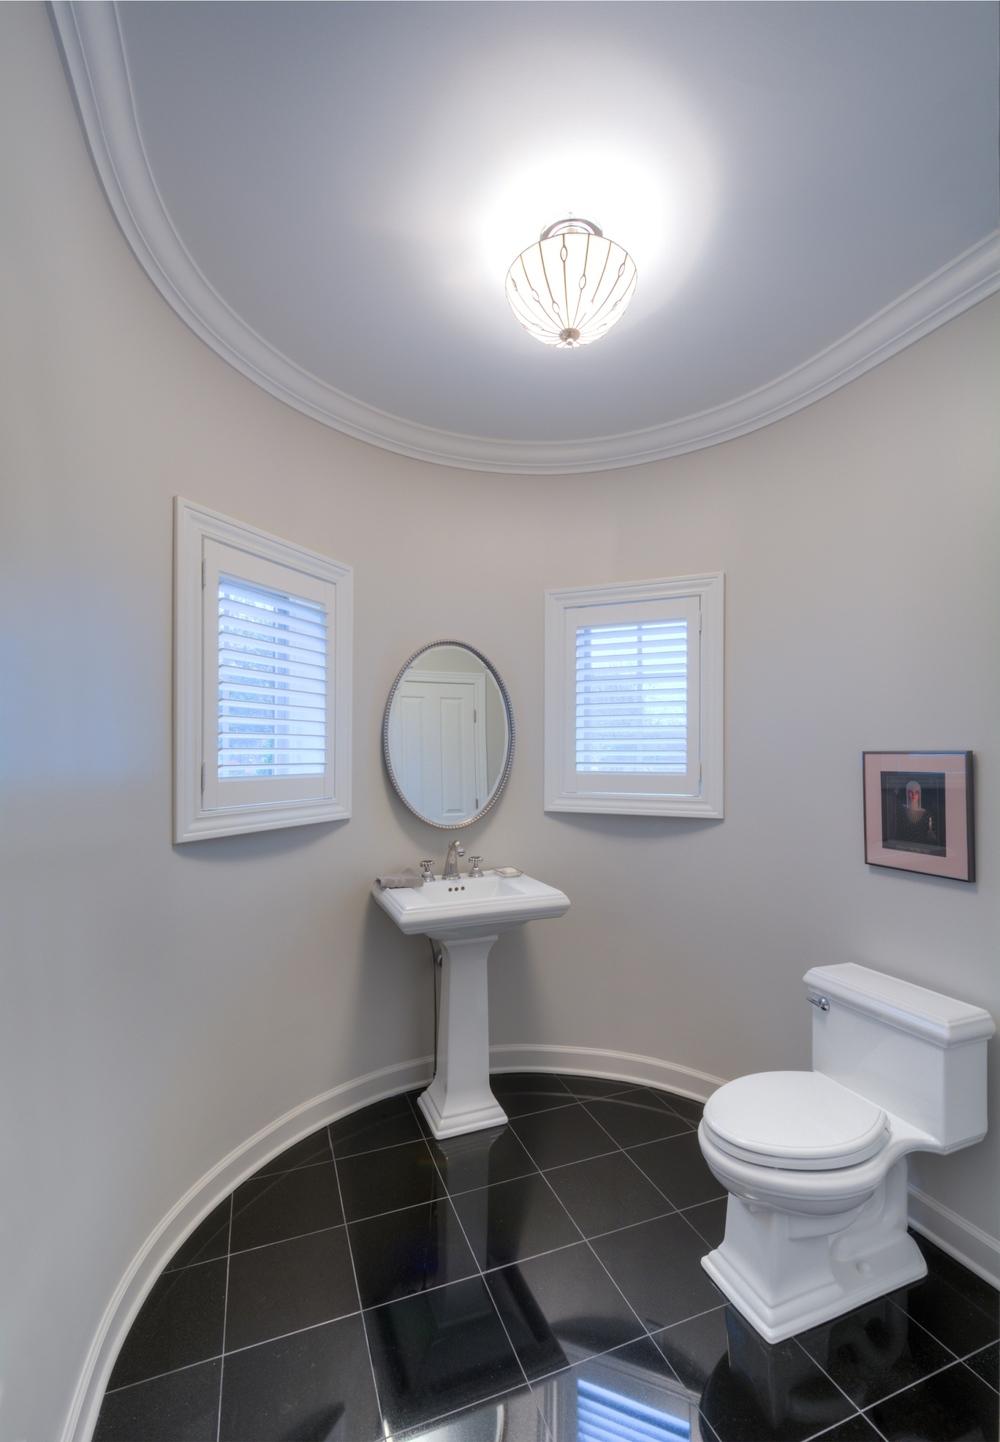 Bathrooms_11.jpg